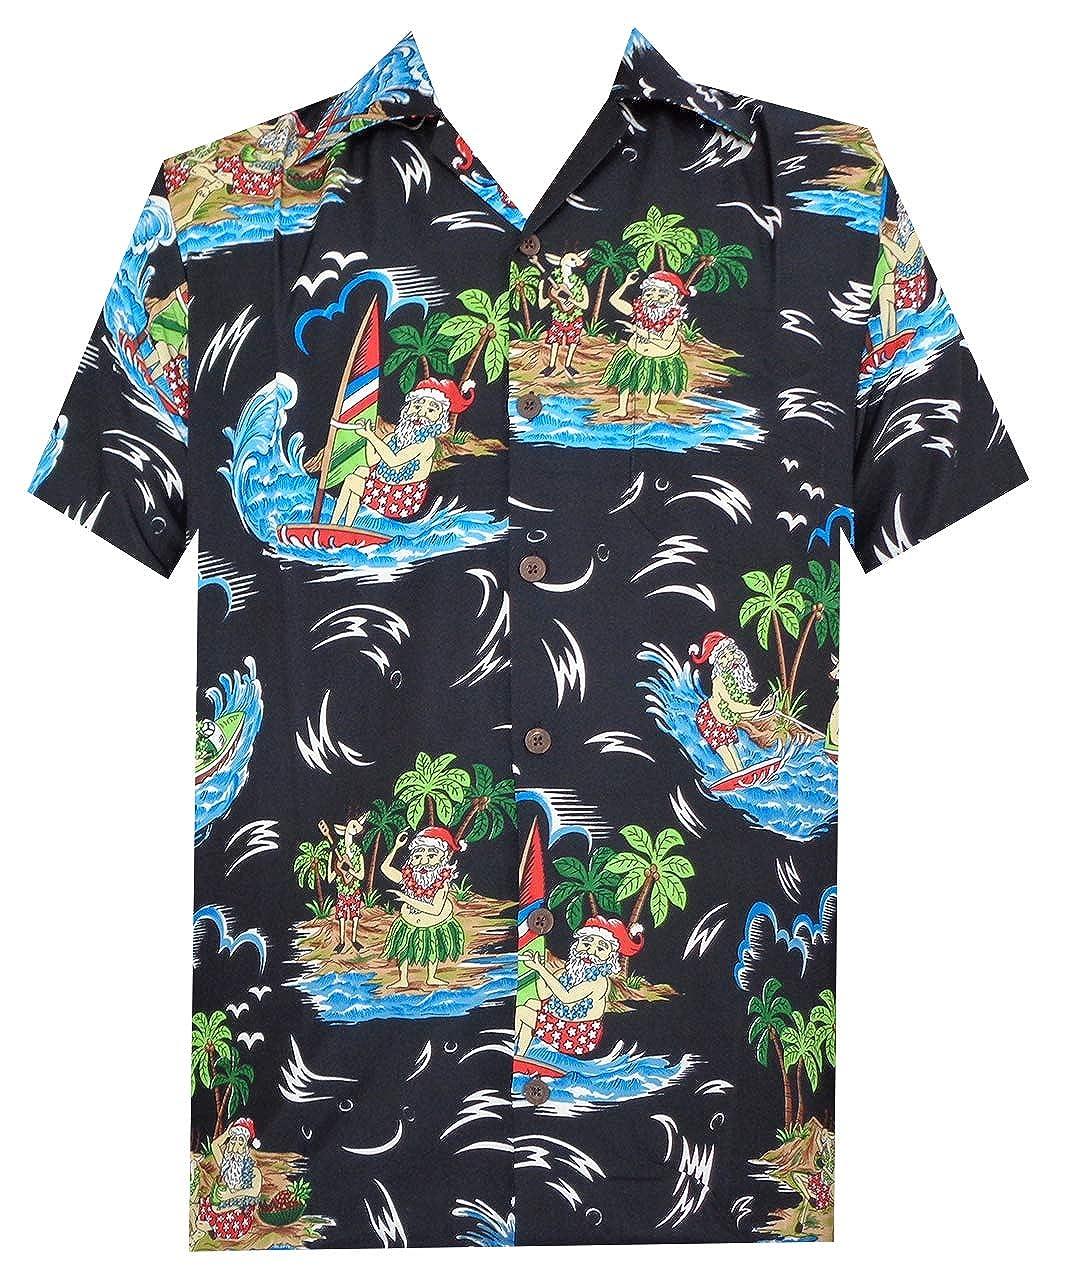 33b12799 Hawaiian Shirt Mens Christmas Santa Claus Party Aloha Holiday Beach at  Amazon Men's Clothing store: